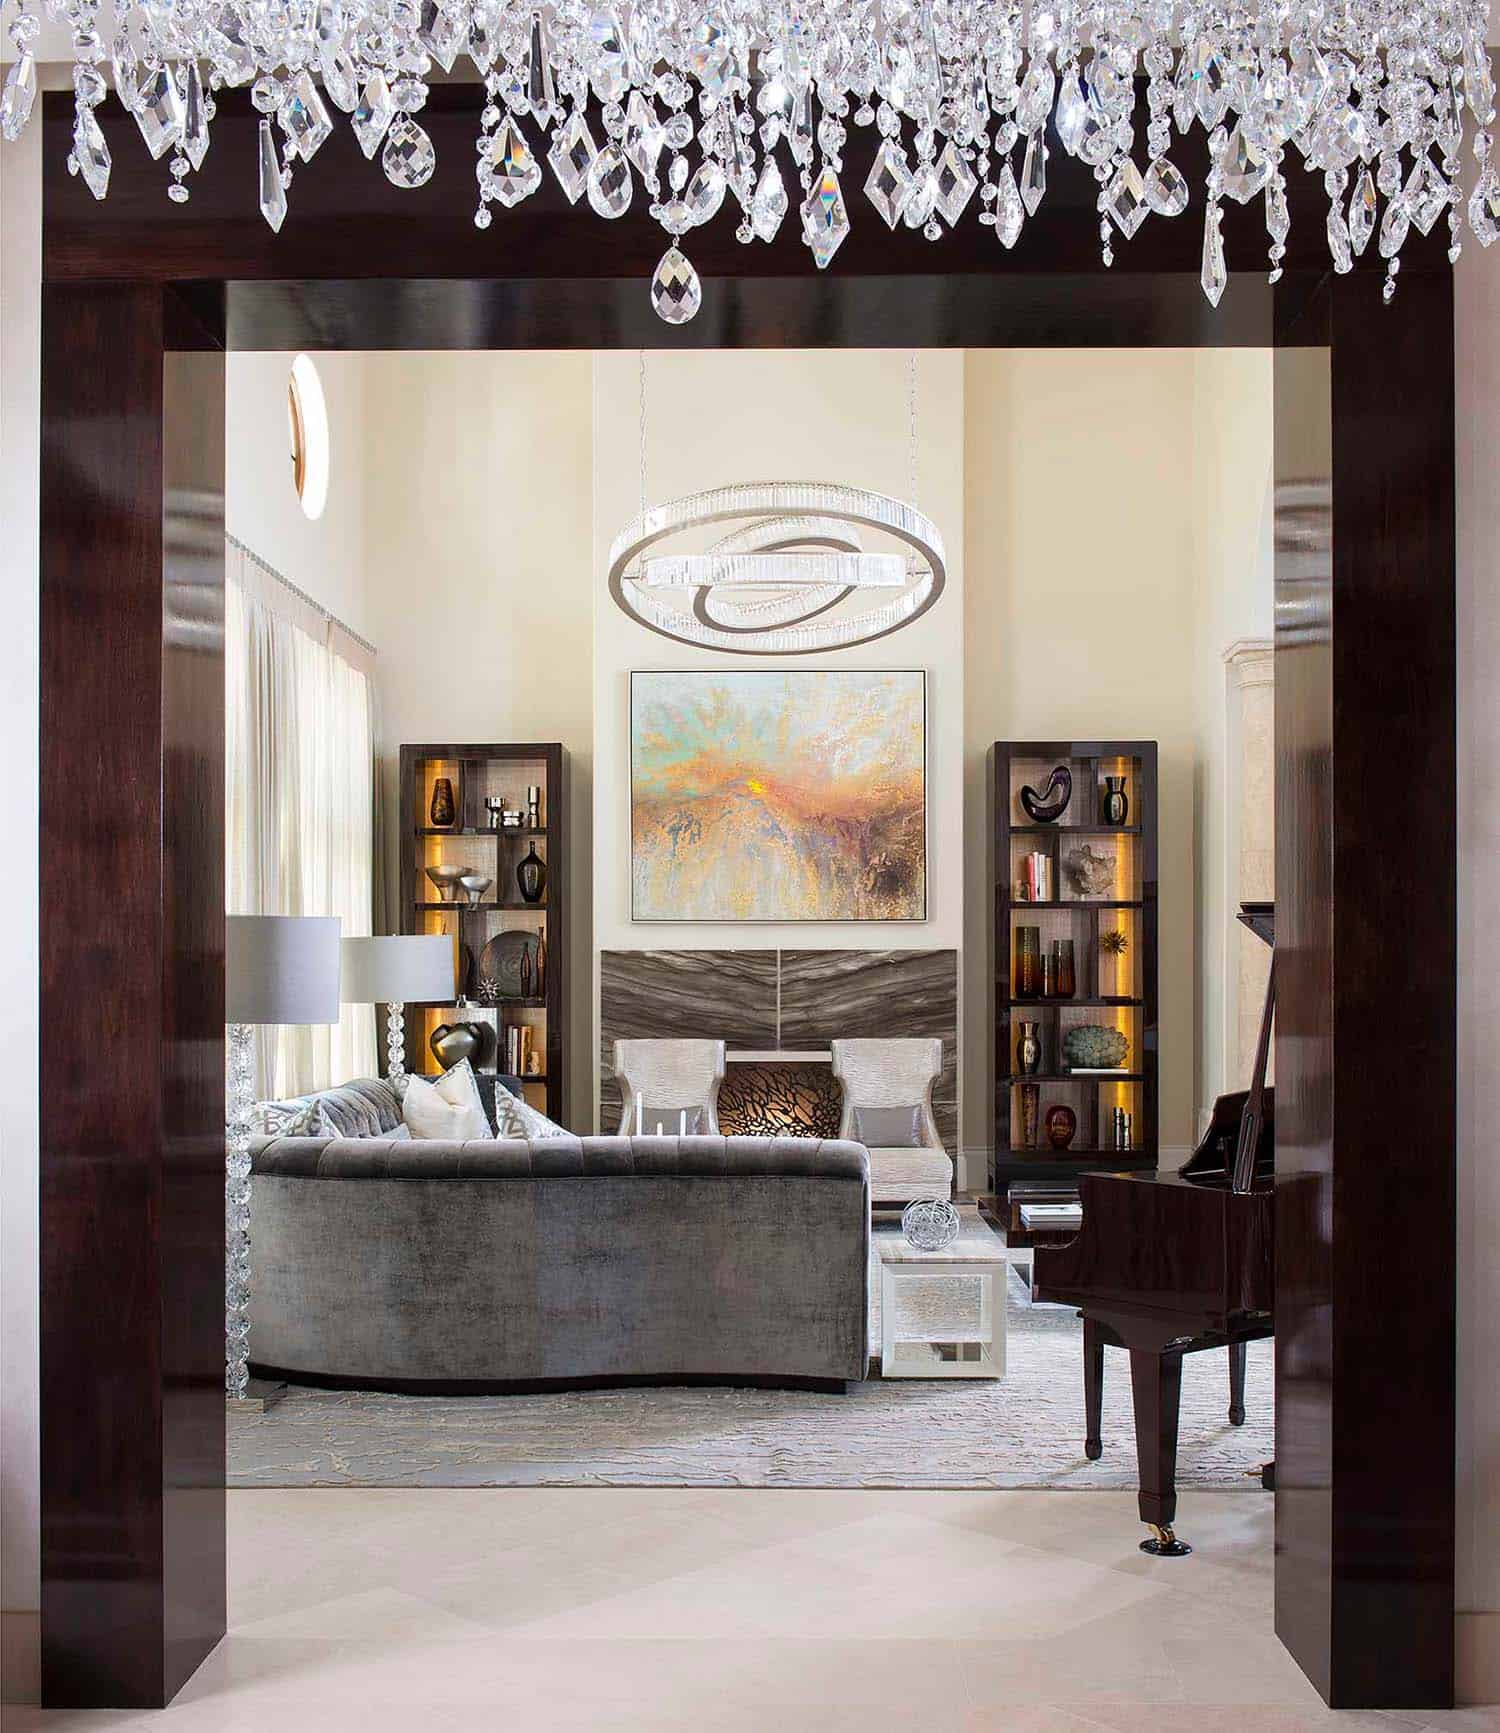 Contemporary Style Home-Dallas Design Group-06-1 Kindesign